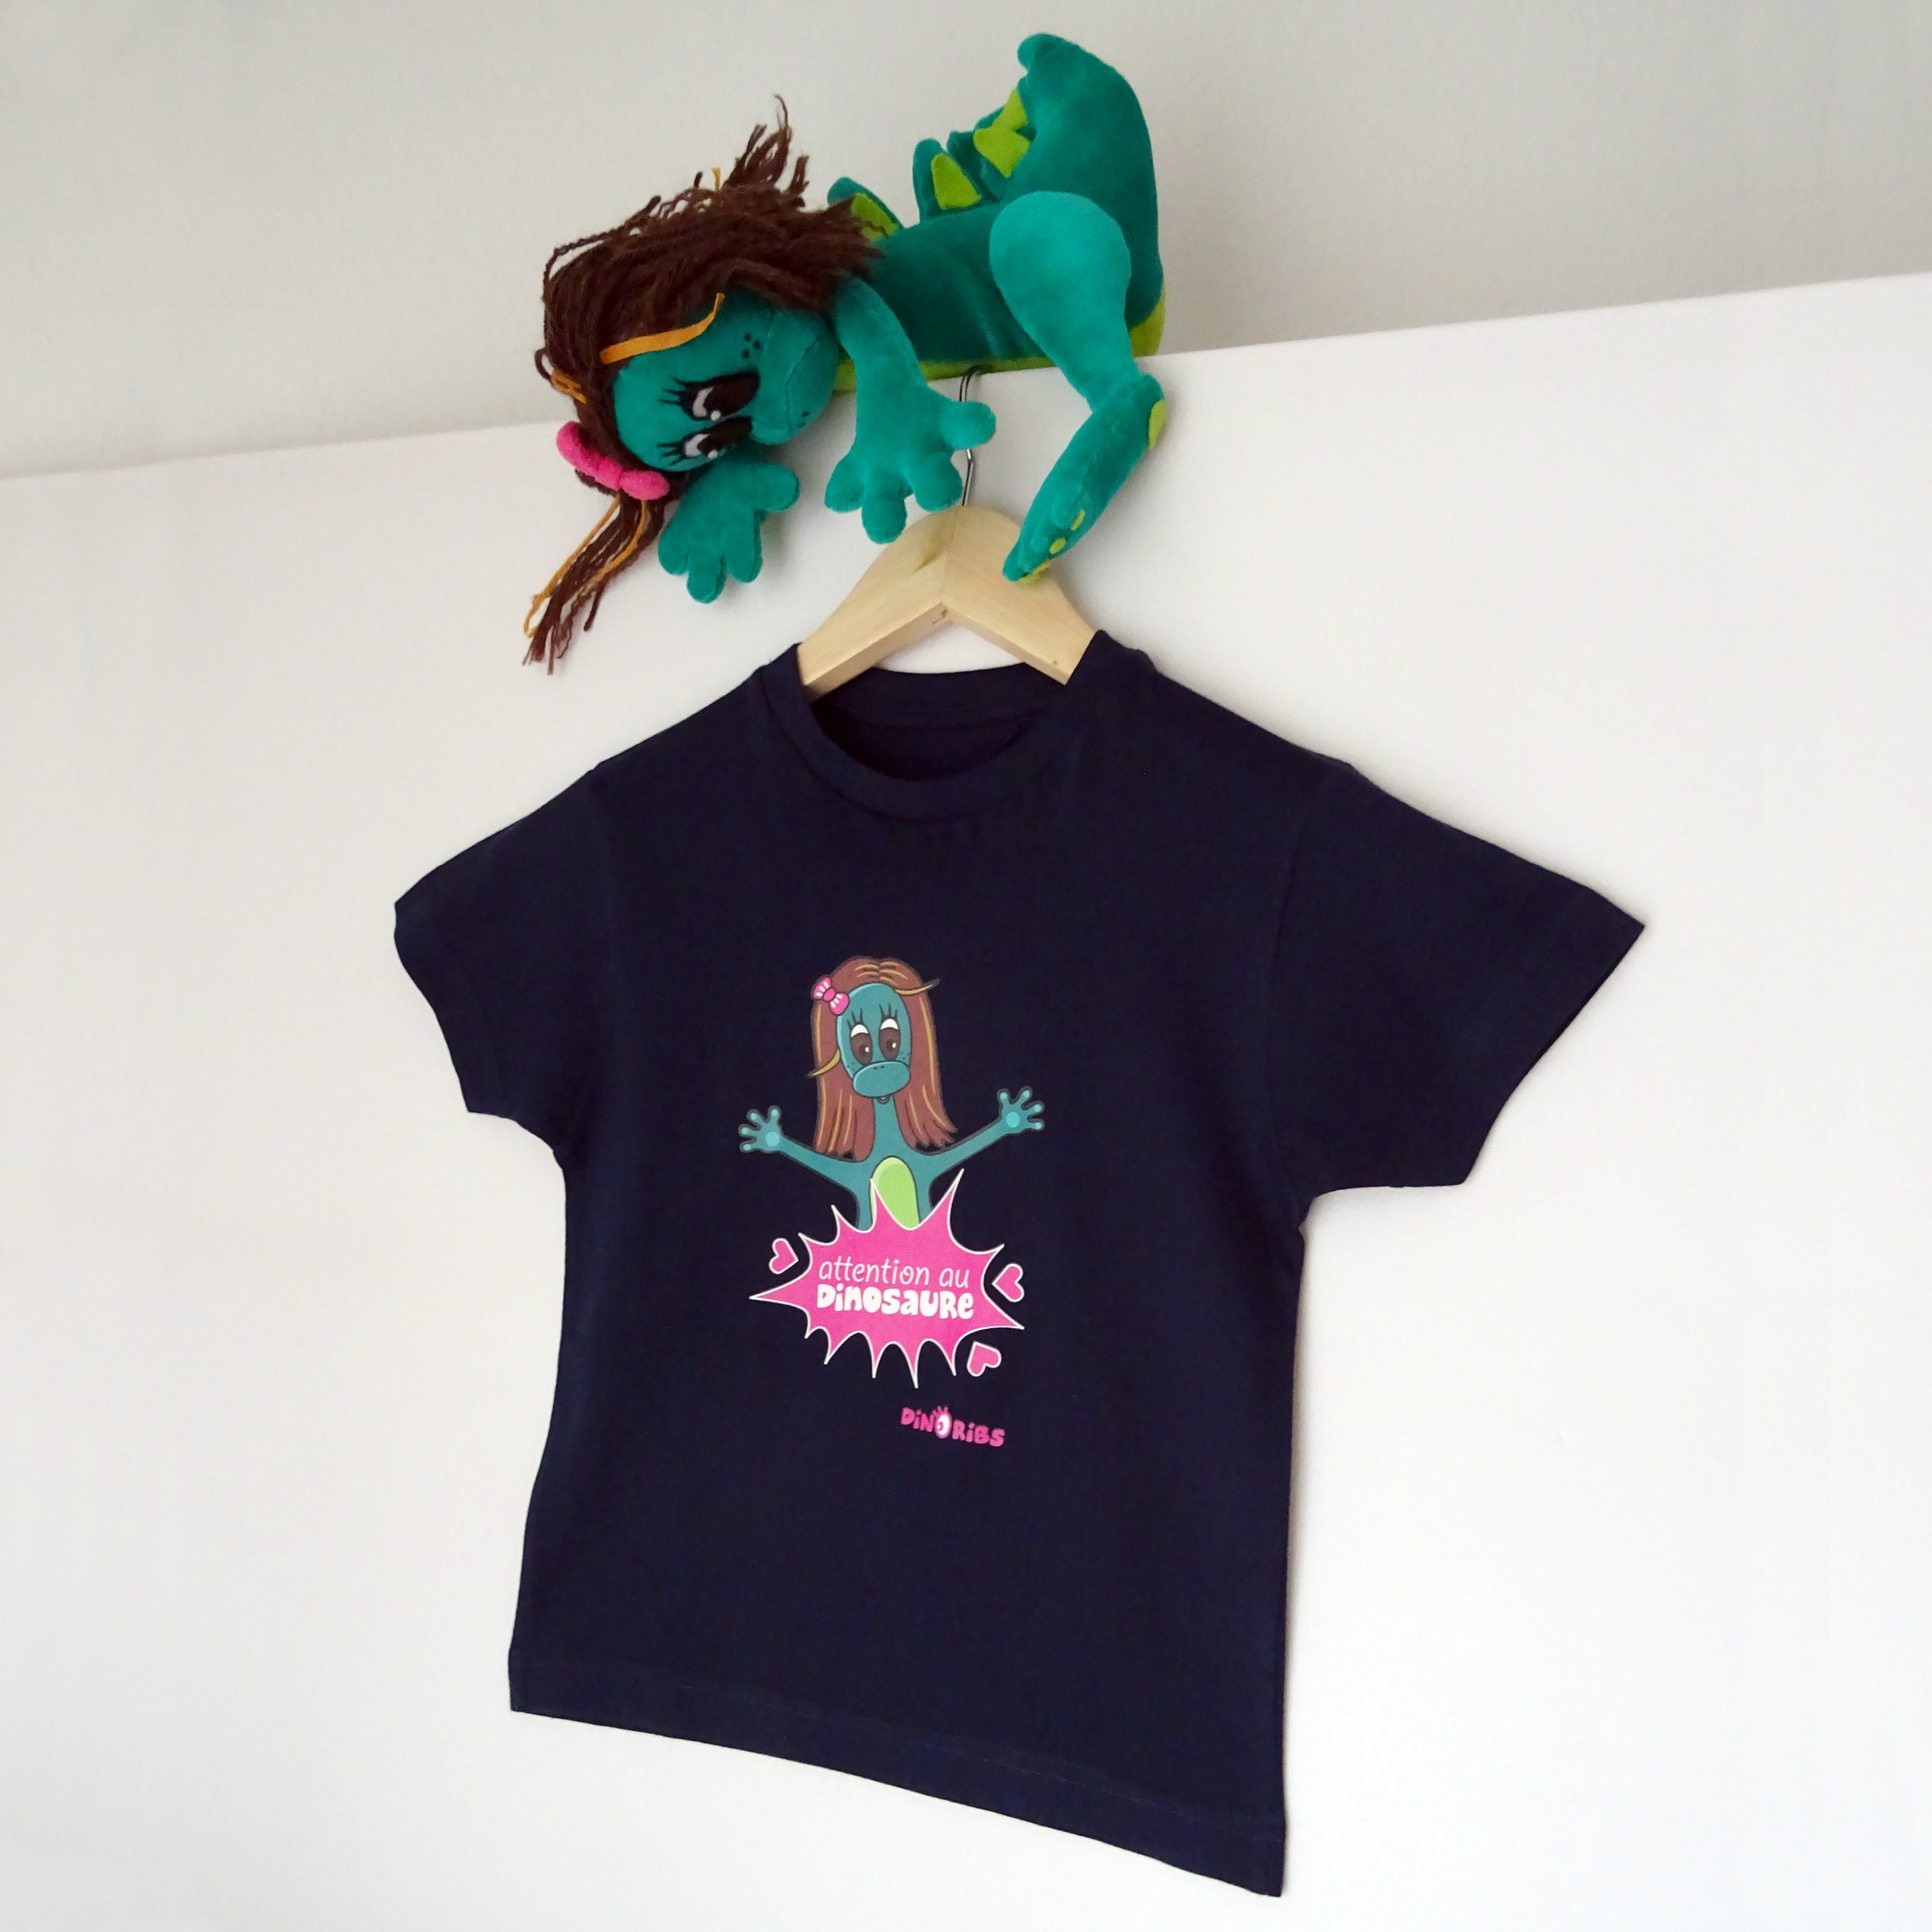 Tee-shirt Dinoribs. Attention au dinosaure